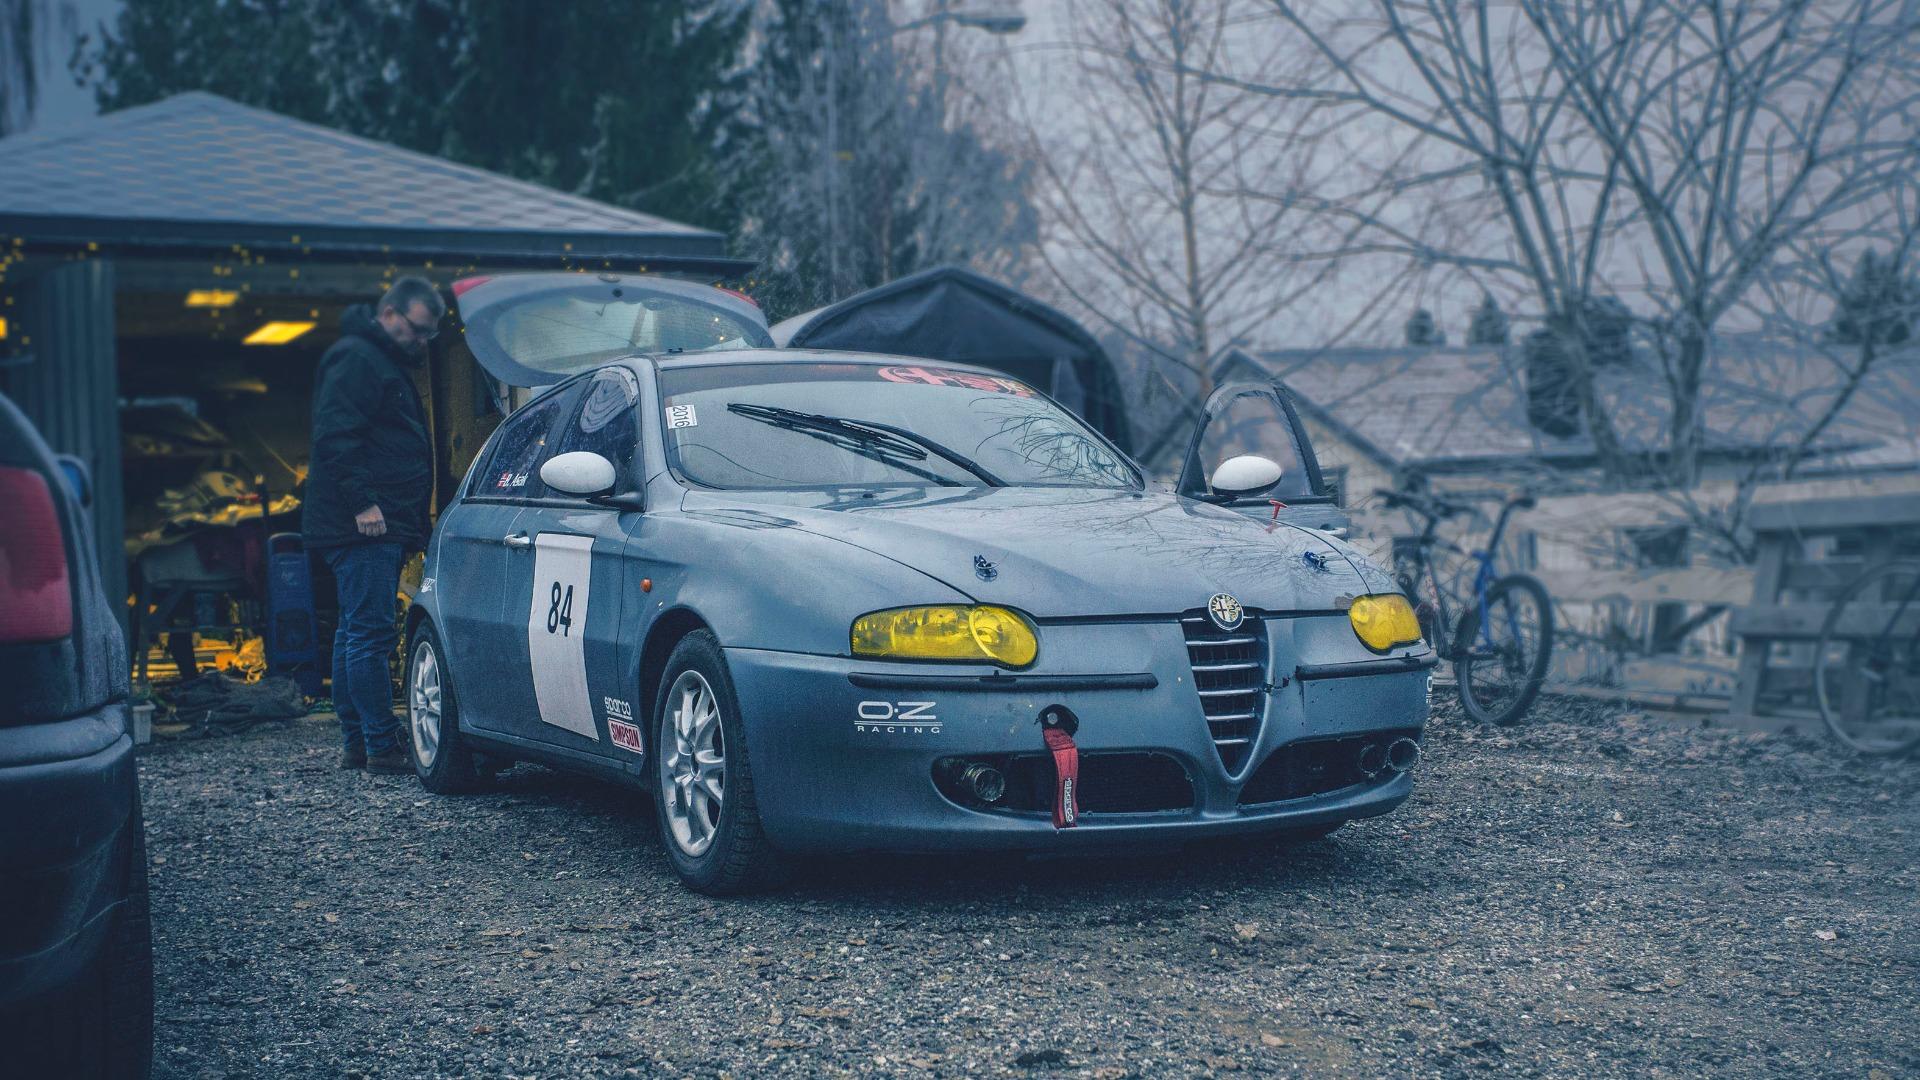 Scuderia Cascata – Drømmen om racingbil